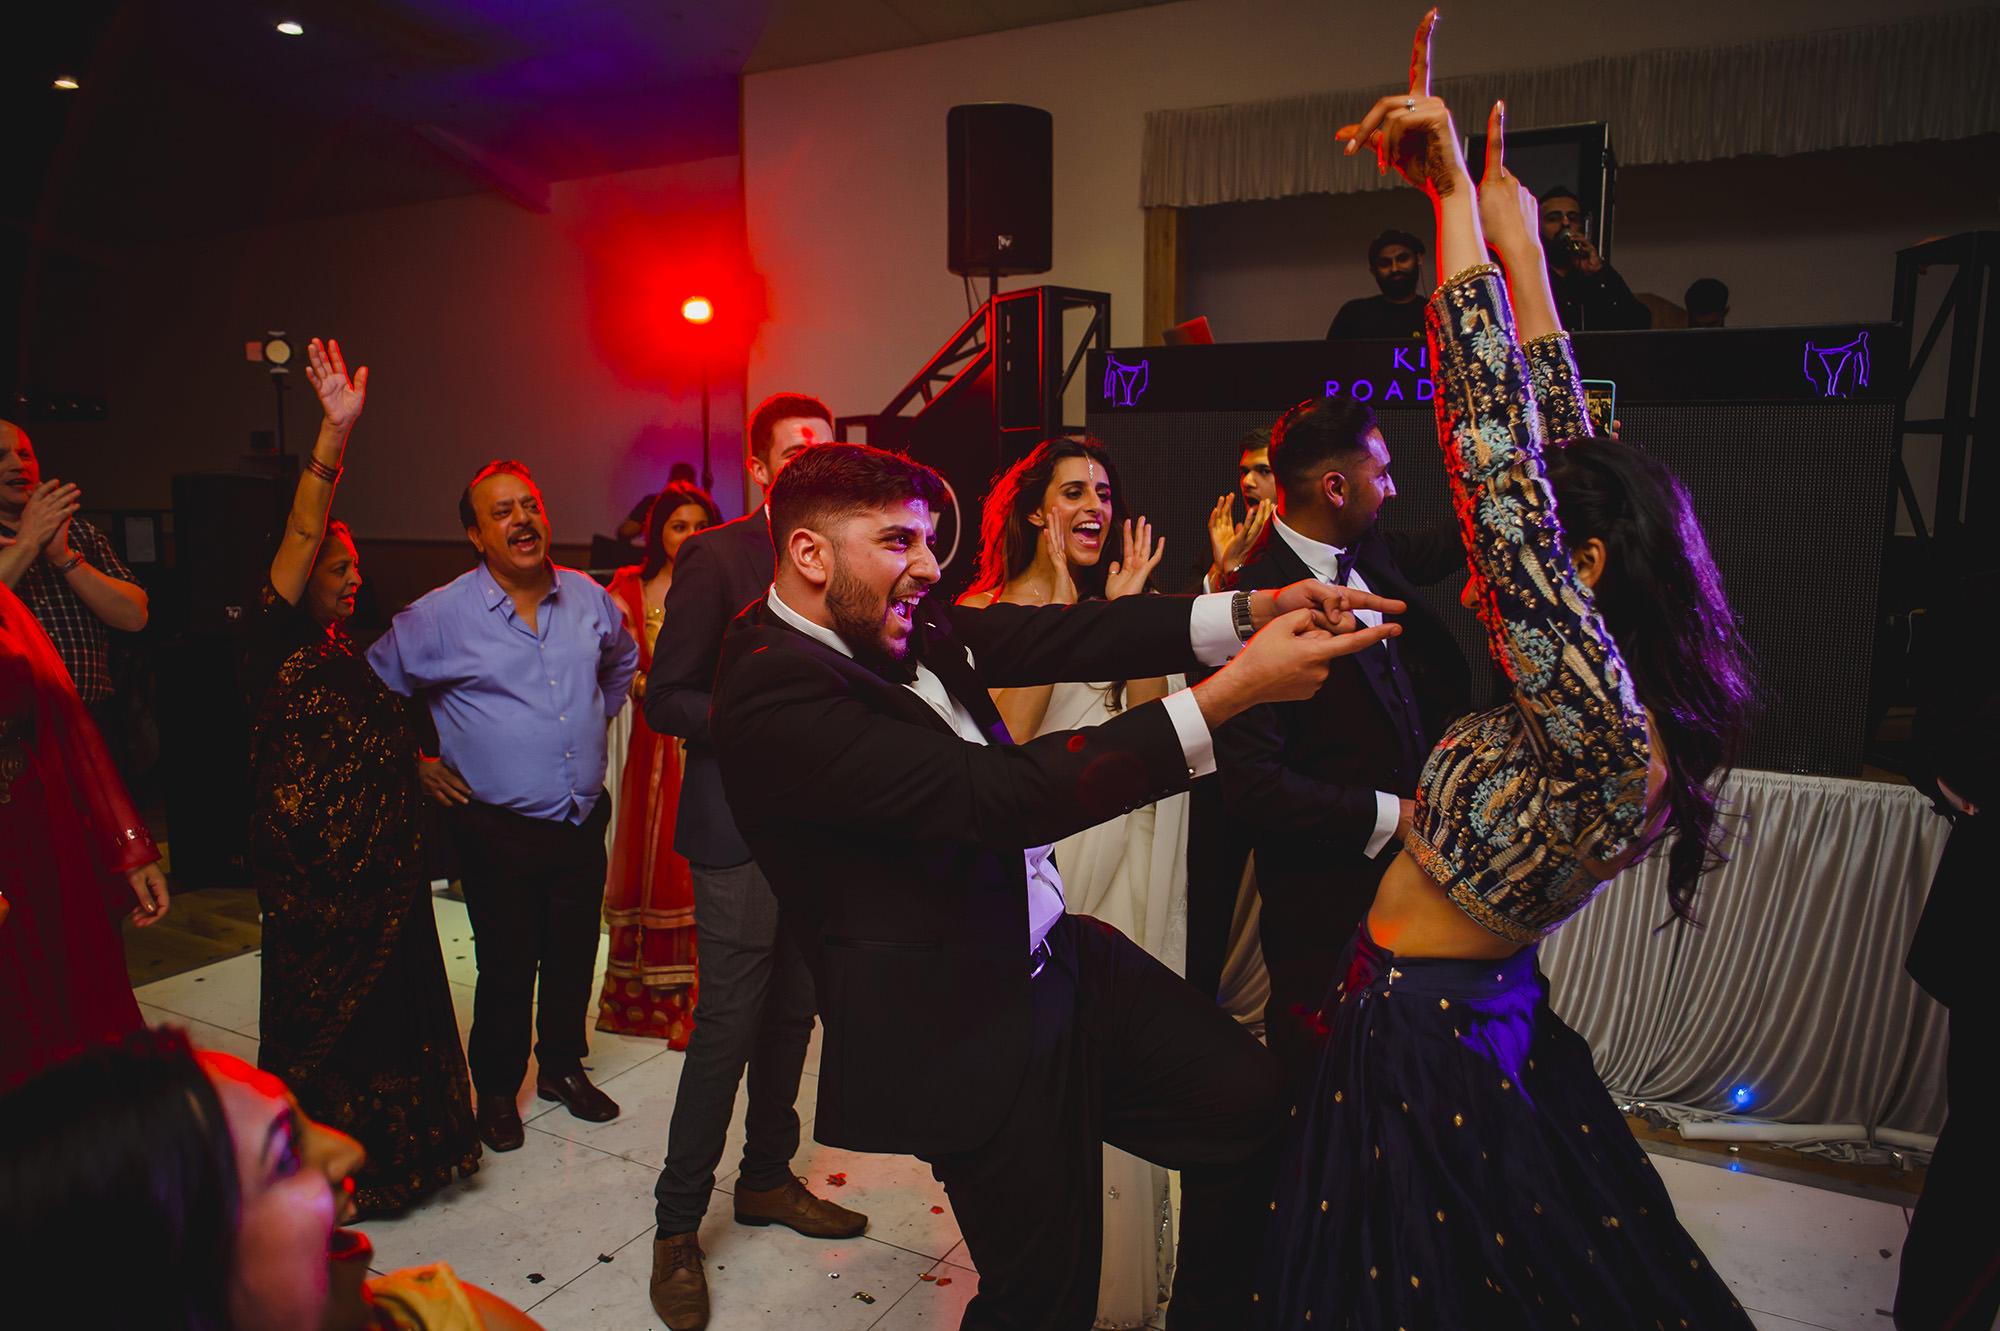 bride and groom celebrating on the dancefloor